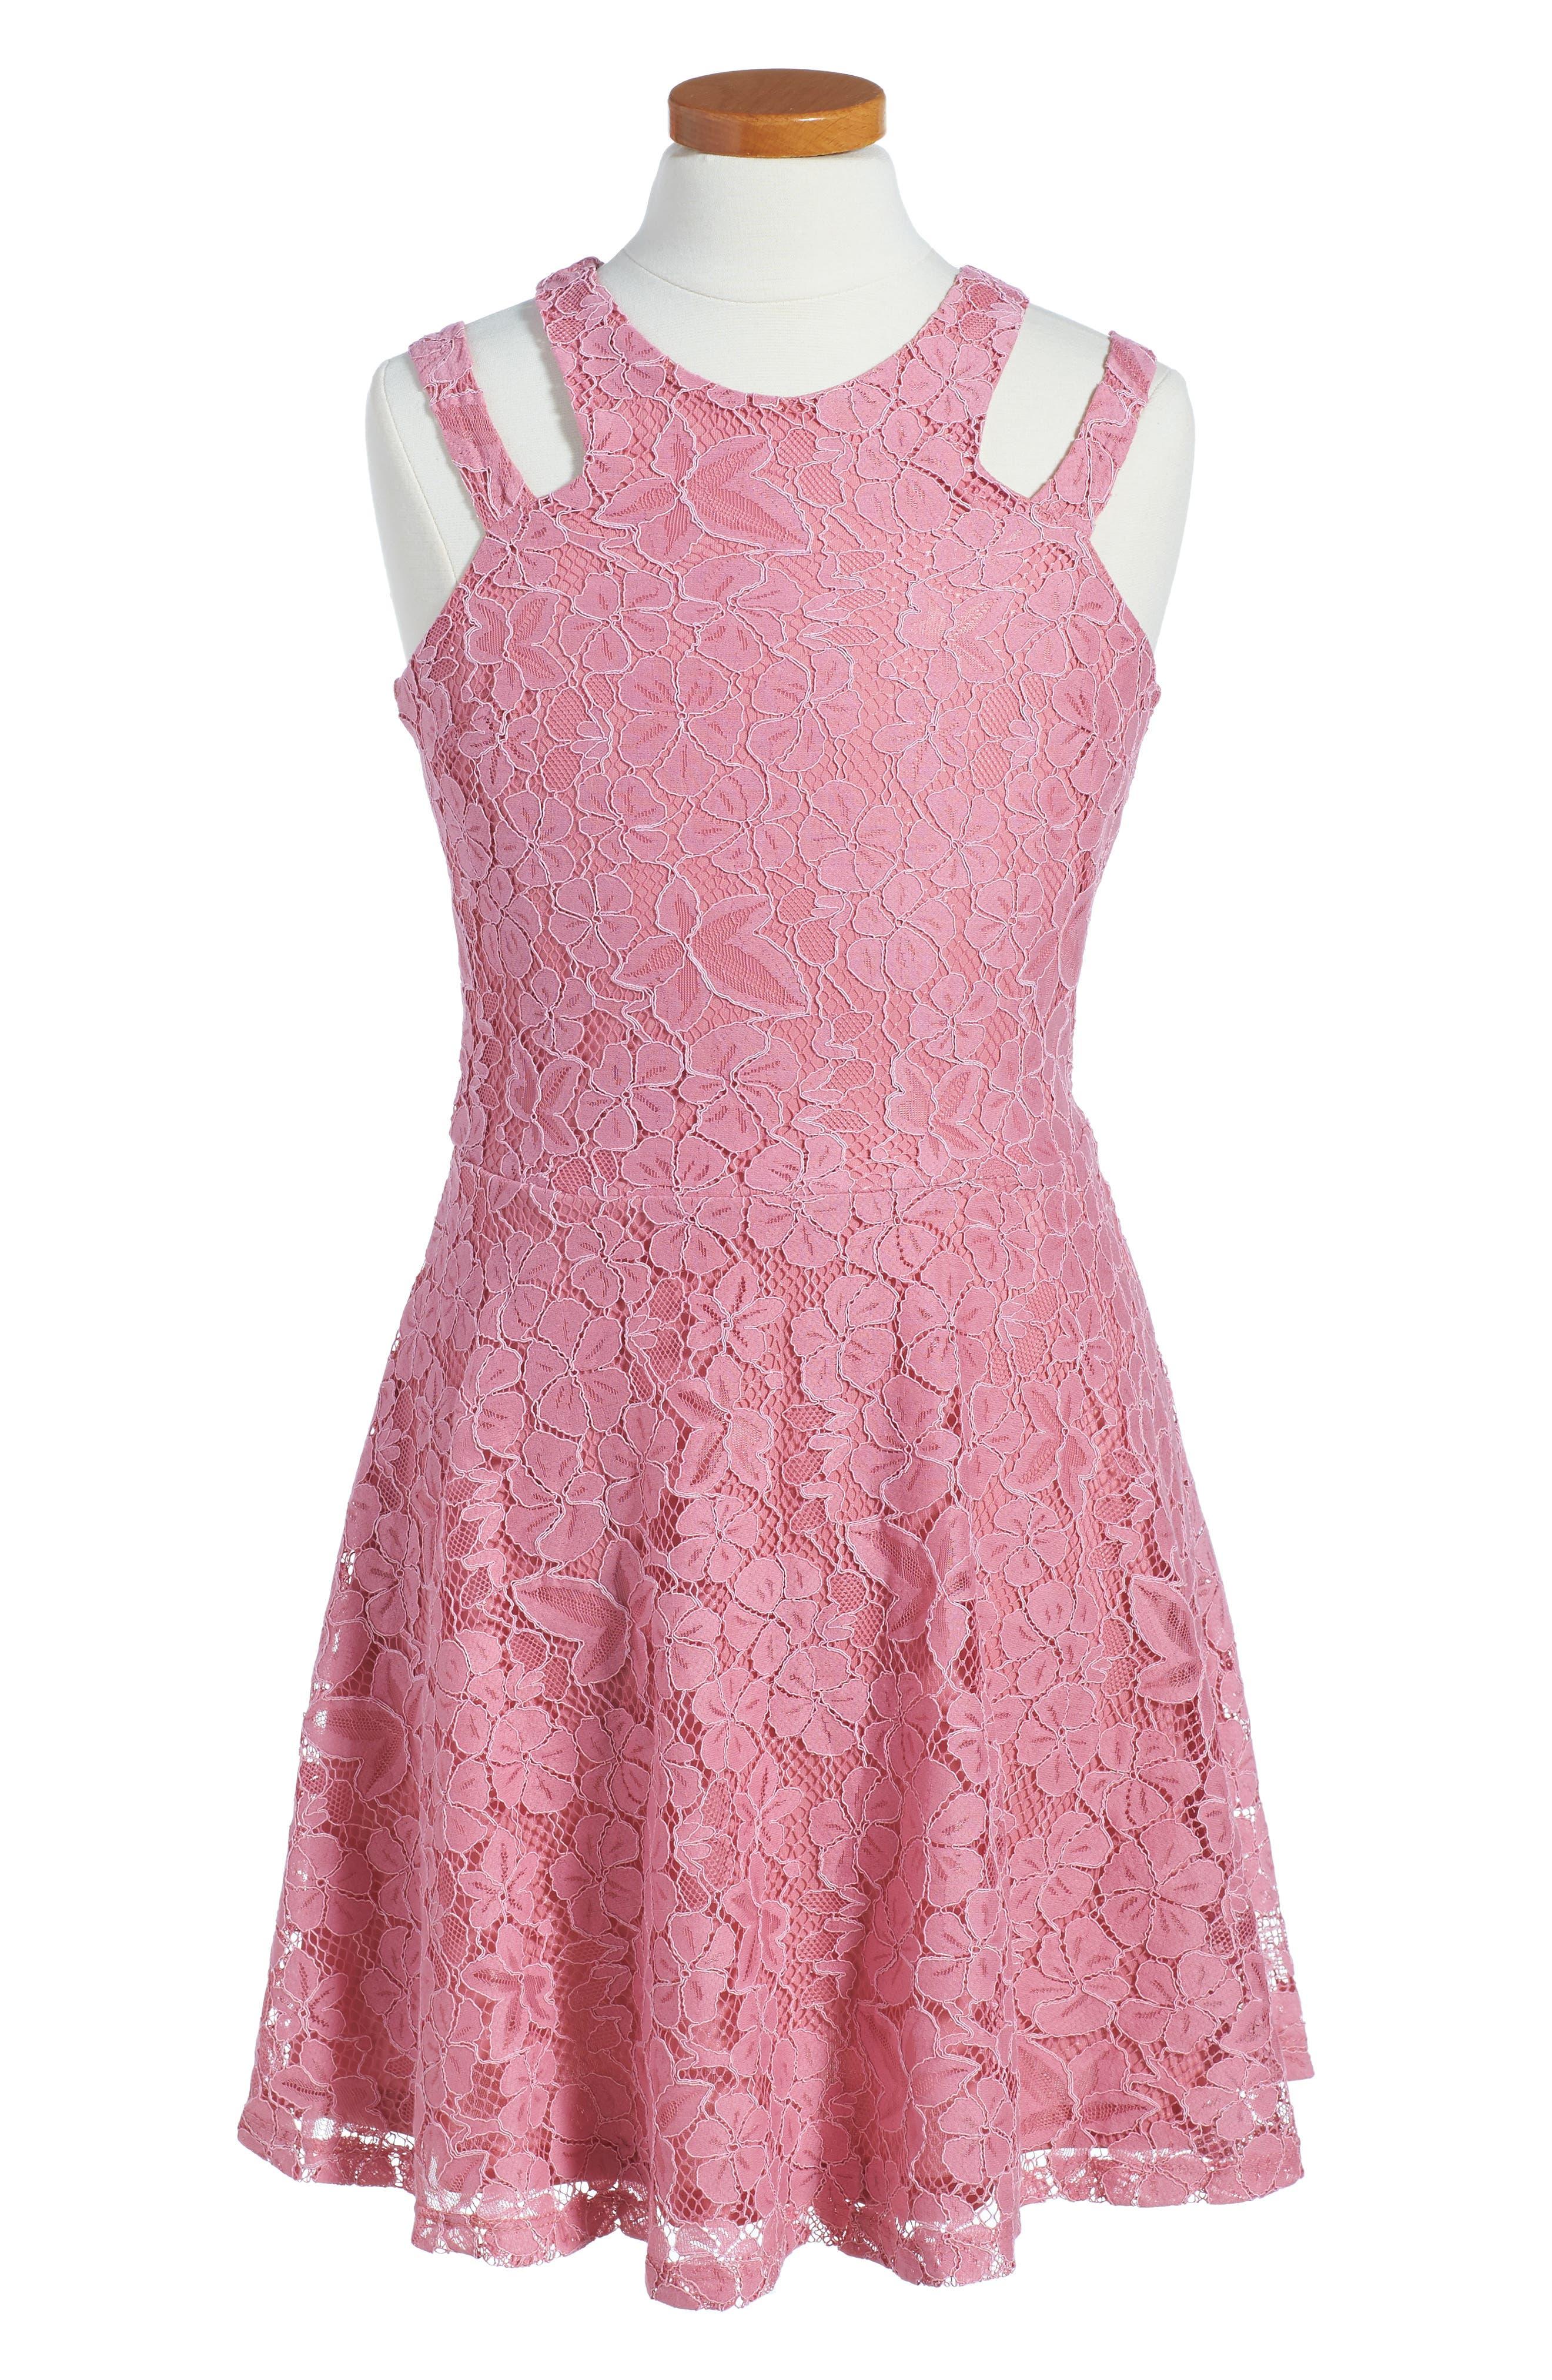 Main Image - Penelope Tree Lace Sleeveless Dress (Big Girls)